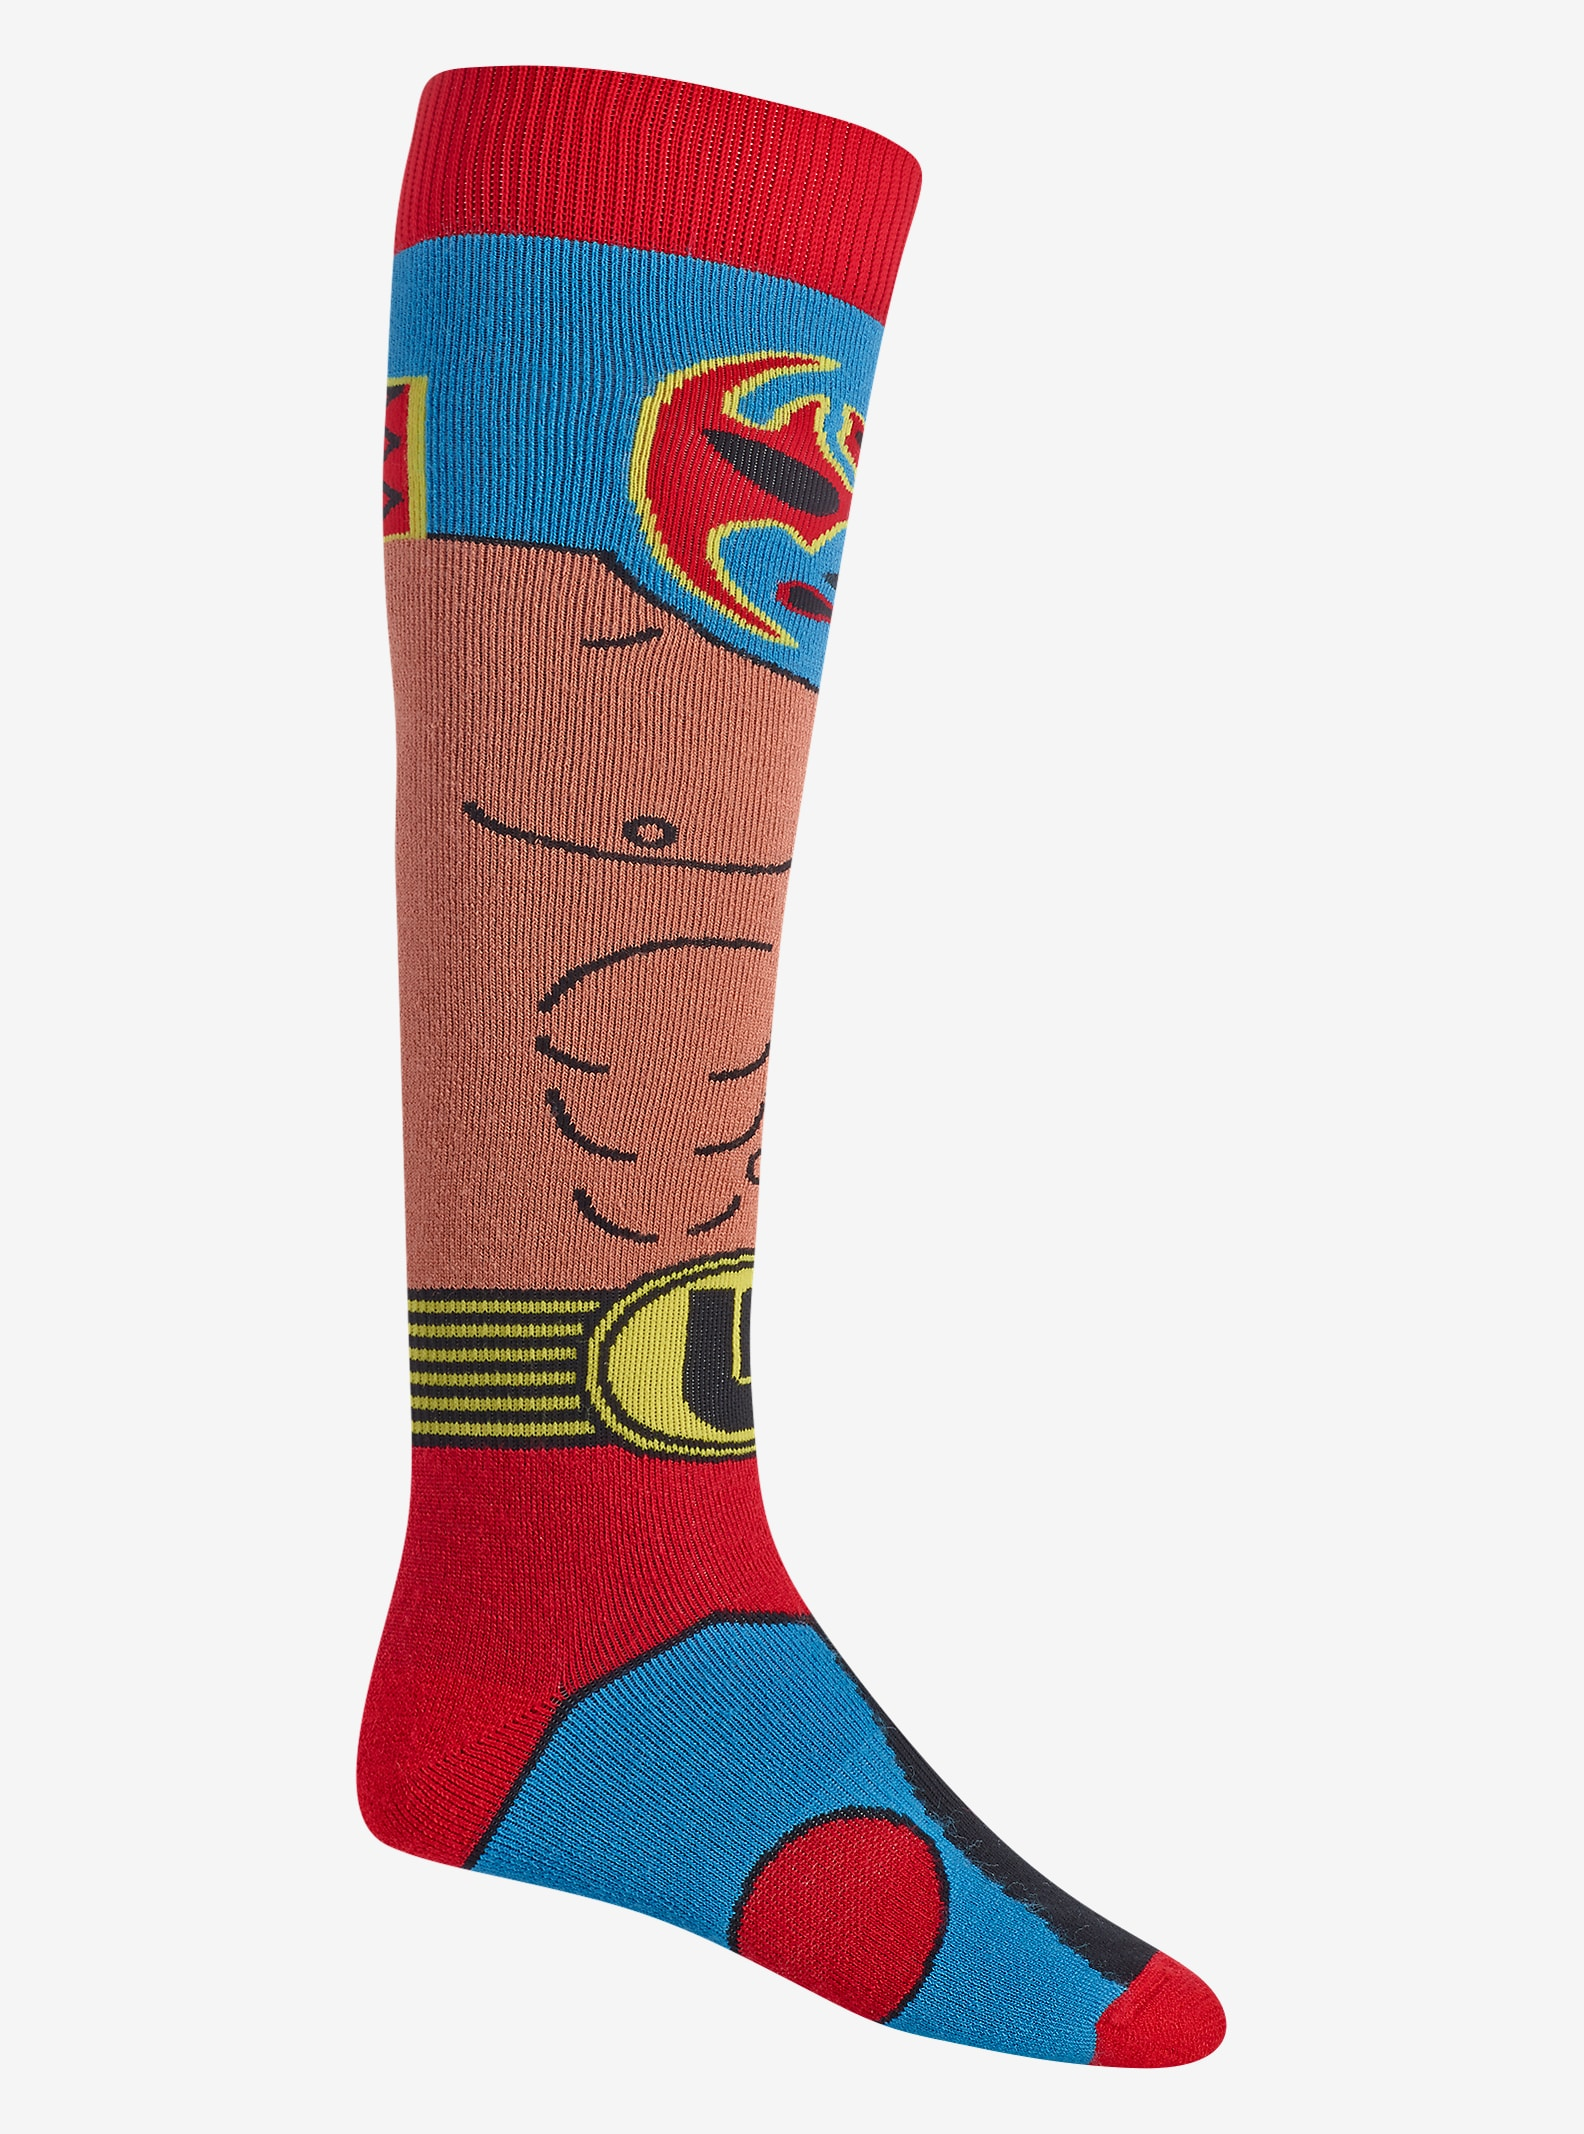 Burton Party Sock shown in Luchador